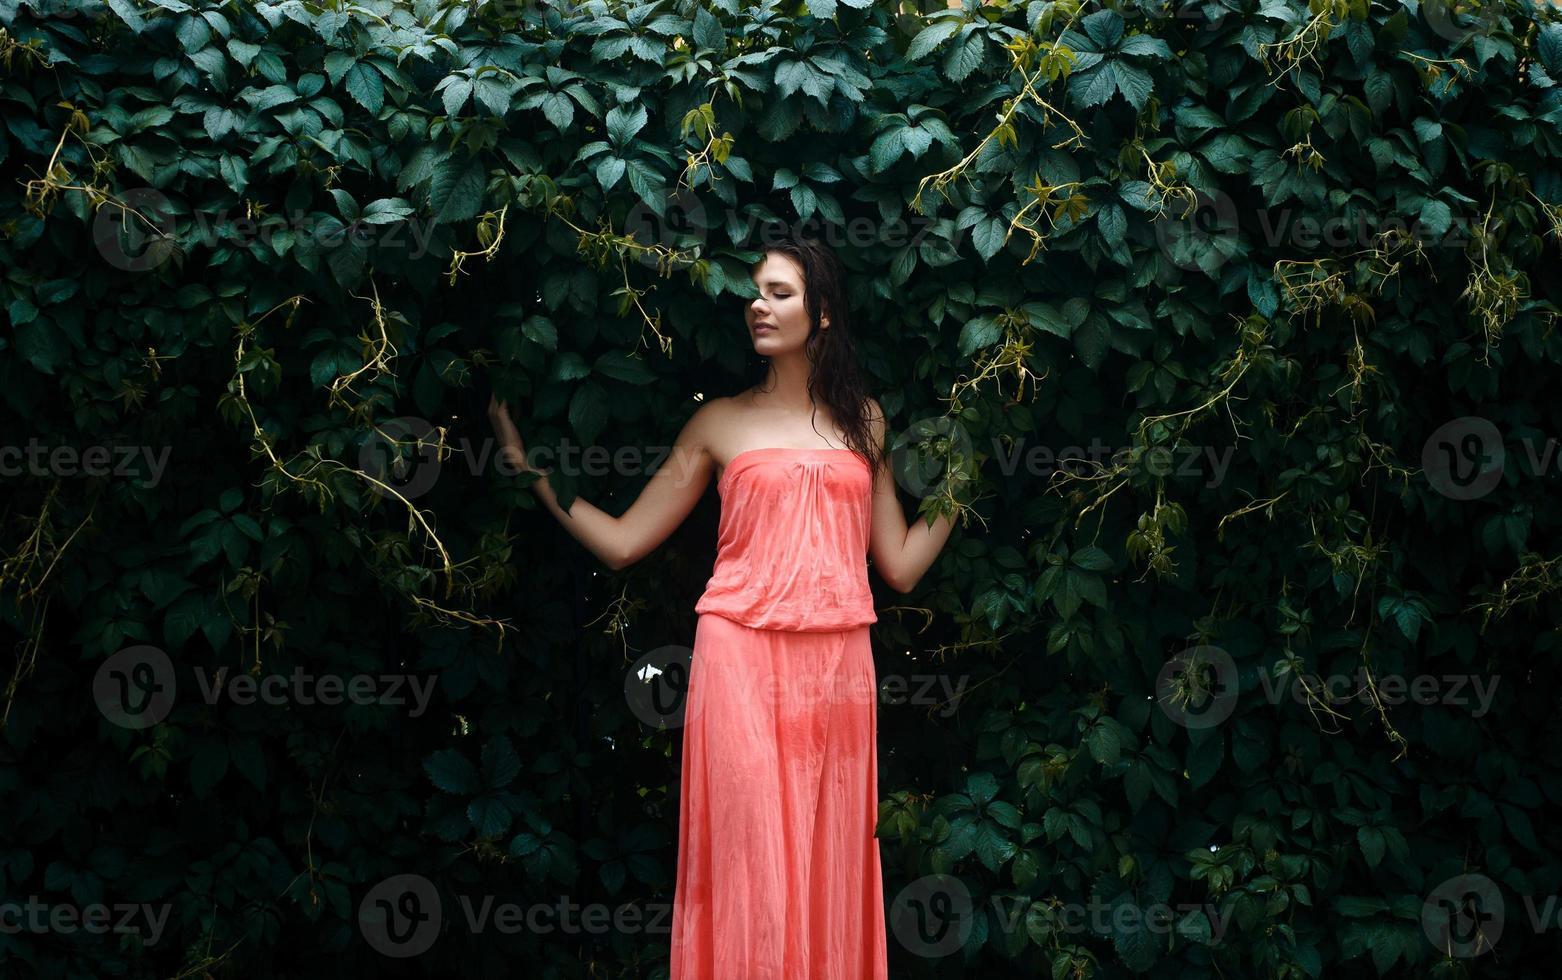 Natural female beauty in summer rain photo